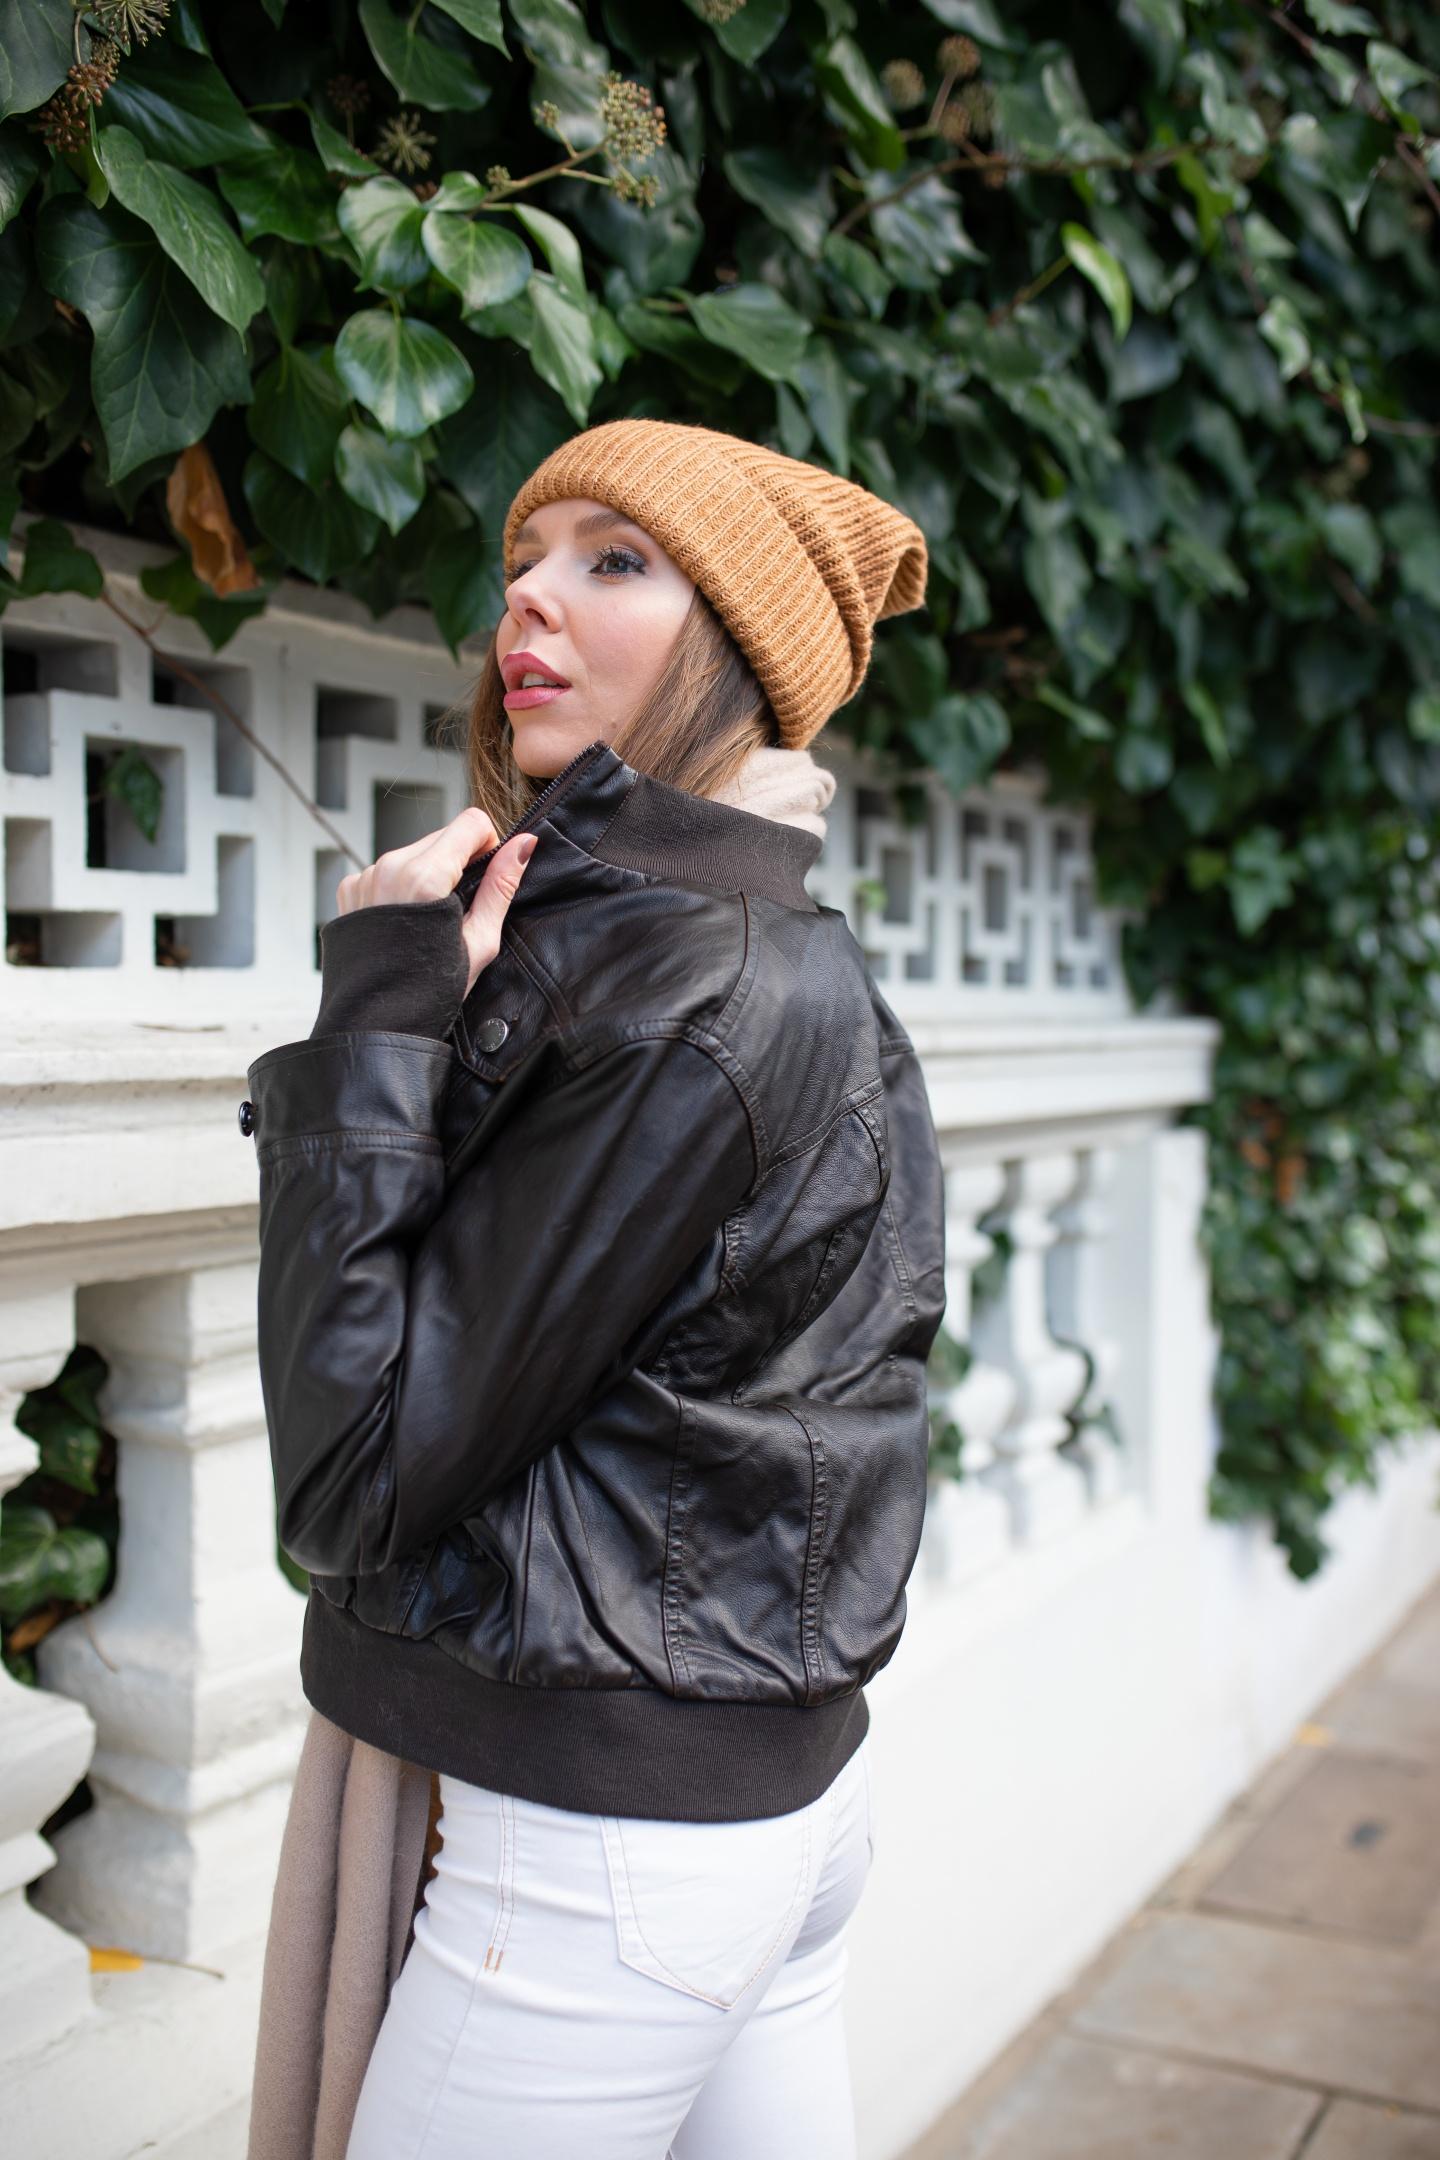 vegan leather jacket, faux leather jacket, sustainable fashion, hoffen, leather jacket, outerwear